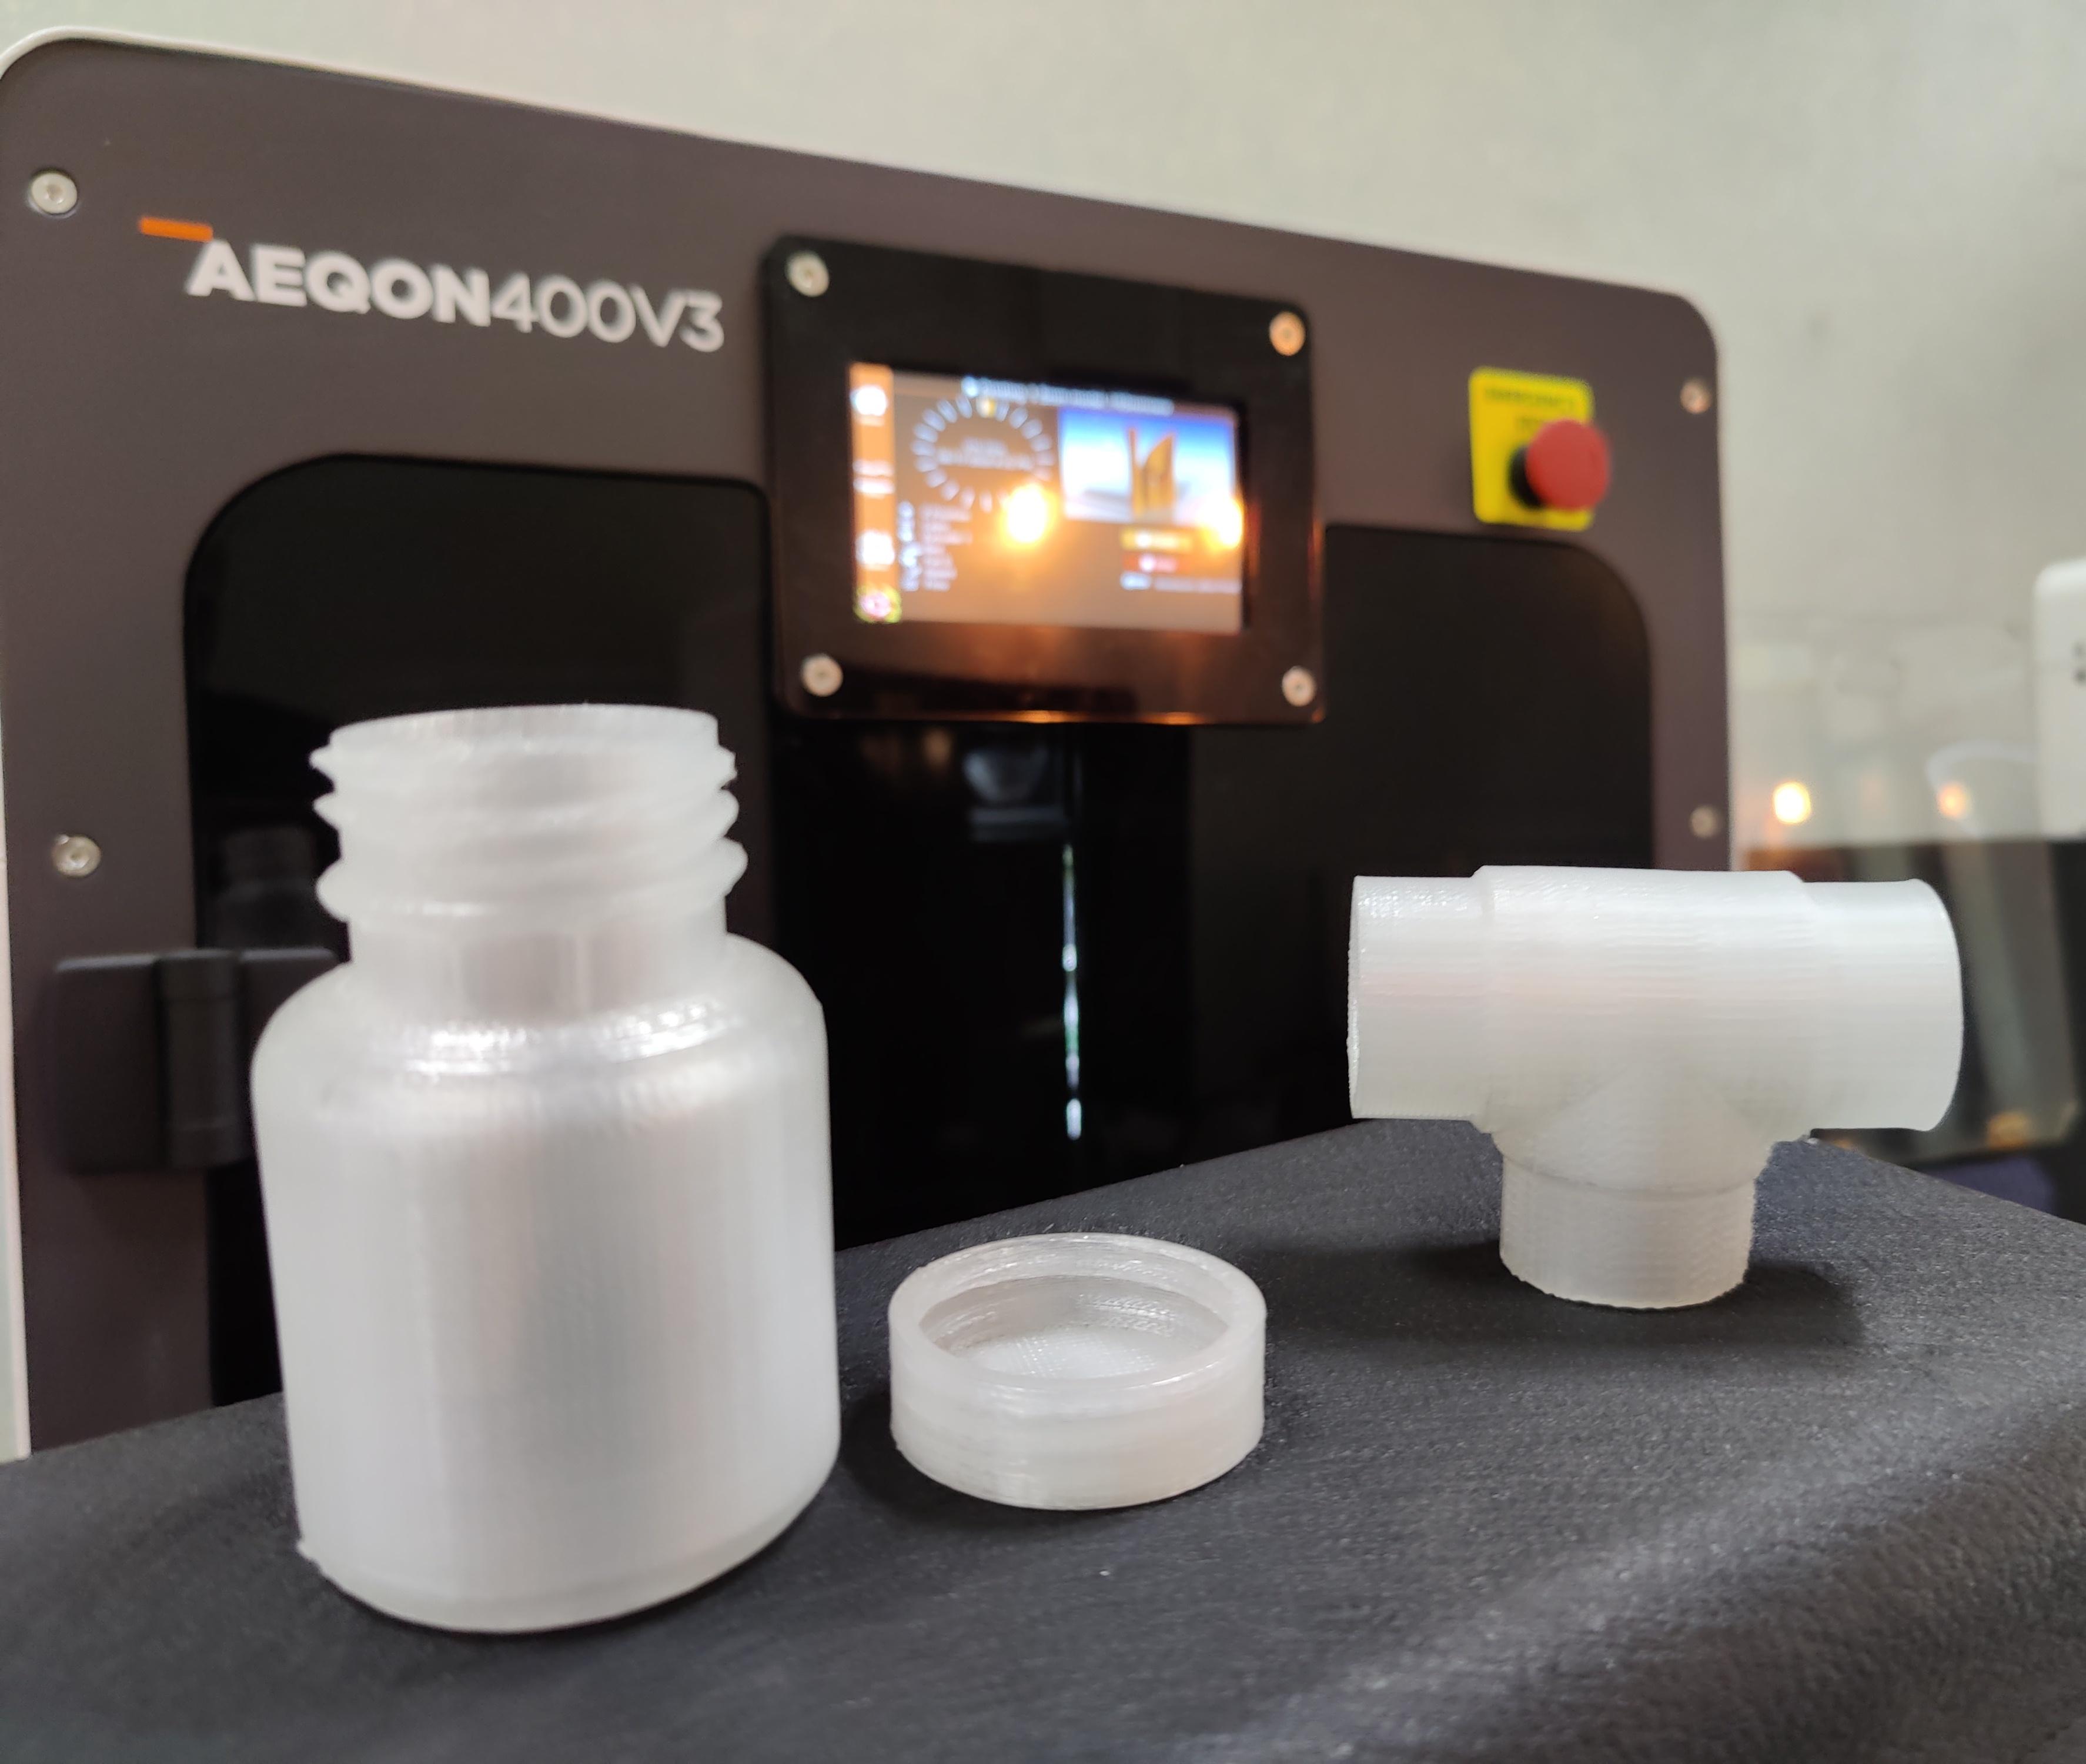 3D Printing With Polypropylene